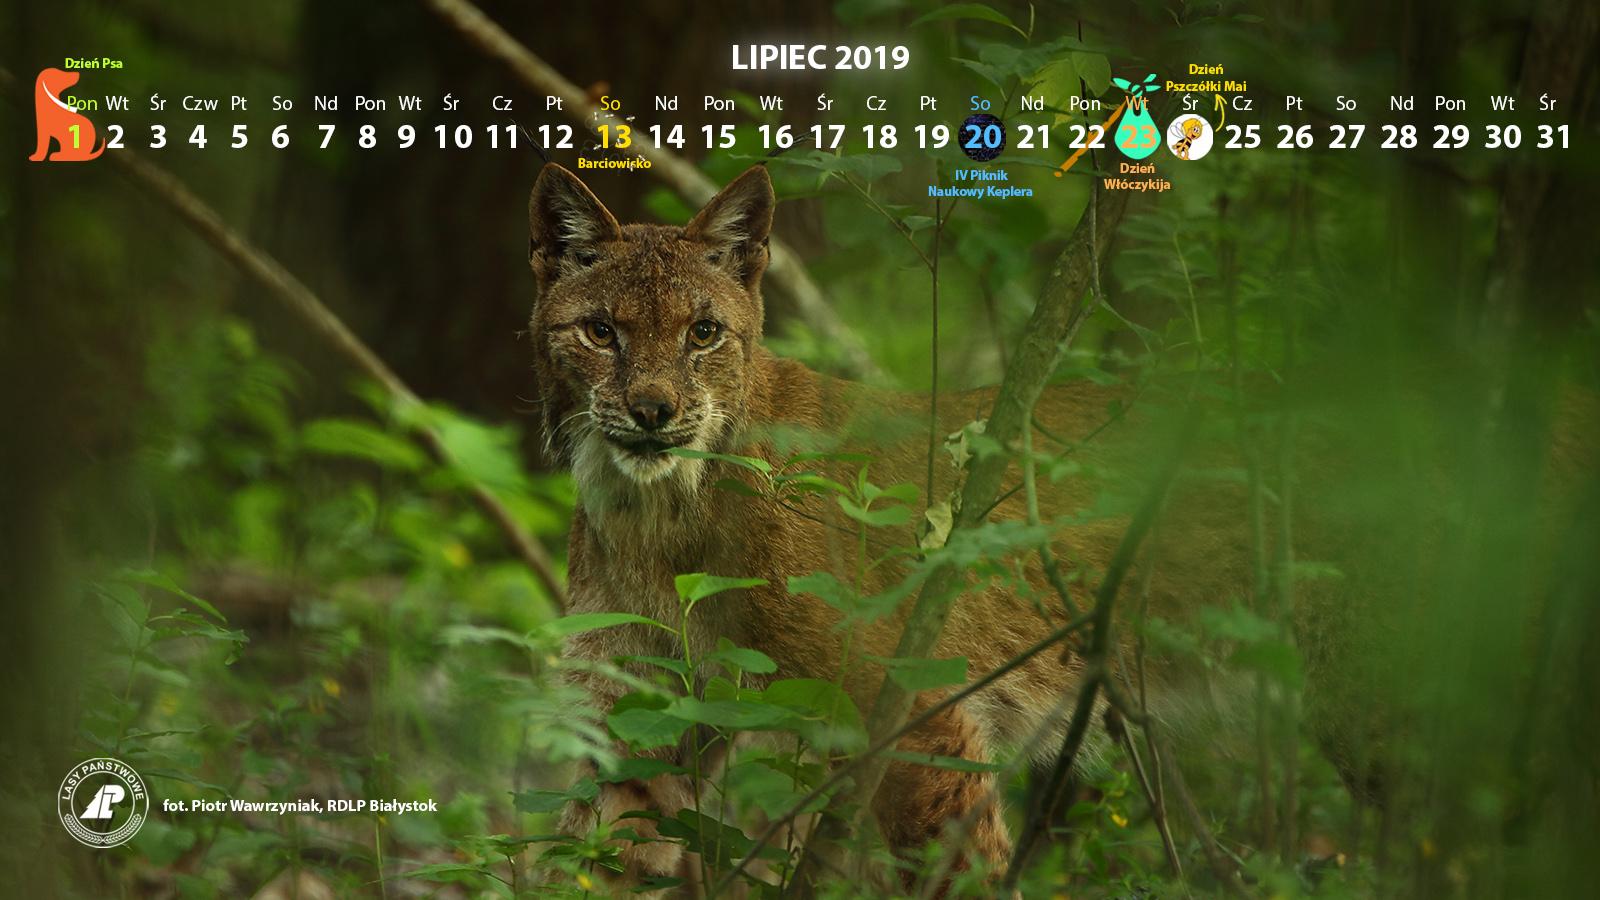 Kalendarz_lipiec2019_1600x900[1].jpg